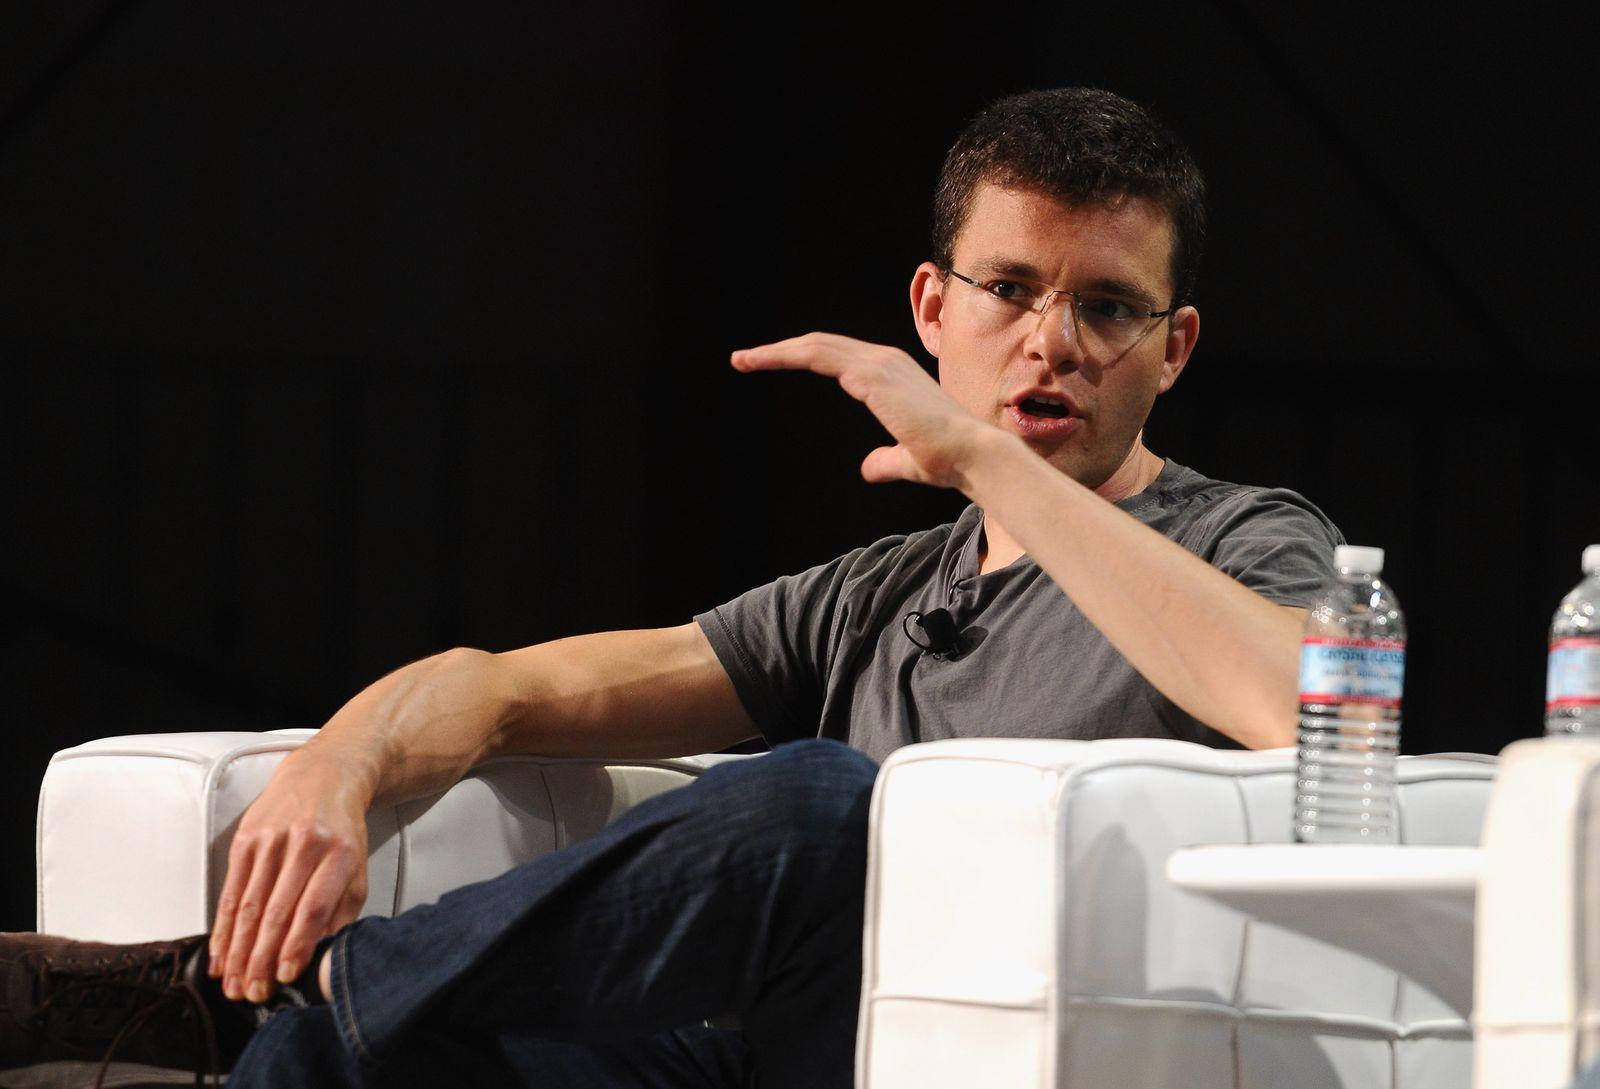 Max Levchin / Yahoo Aufsichtsrat, Paypal Co-Founder